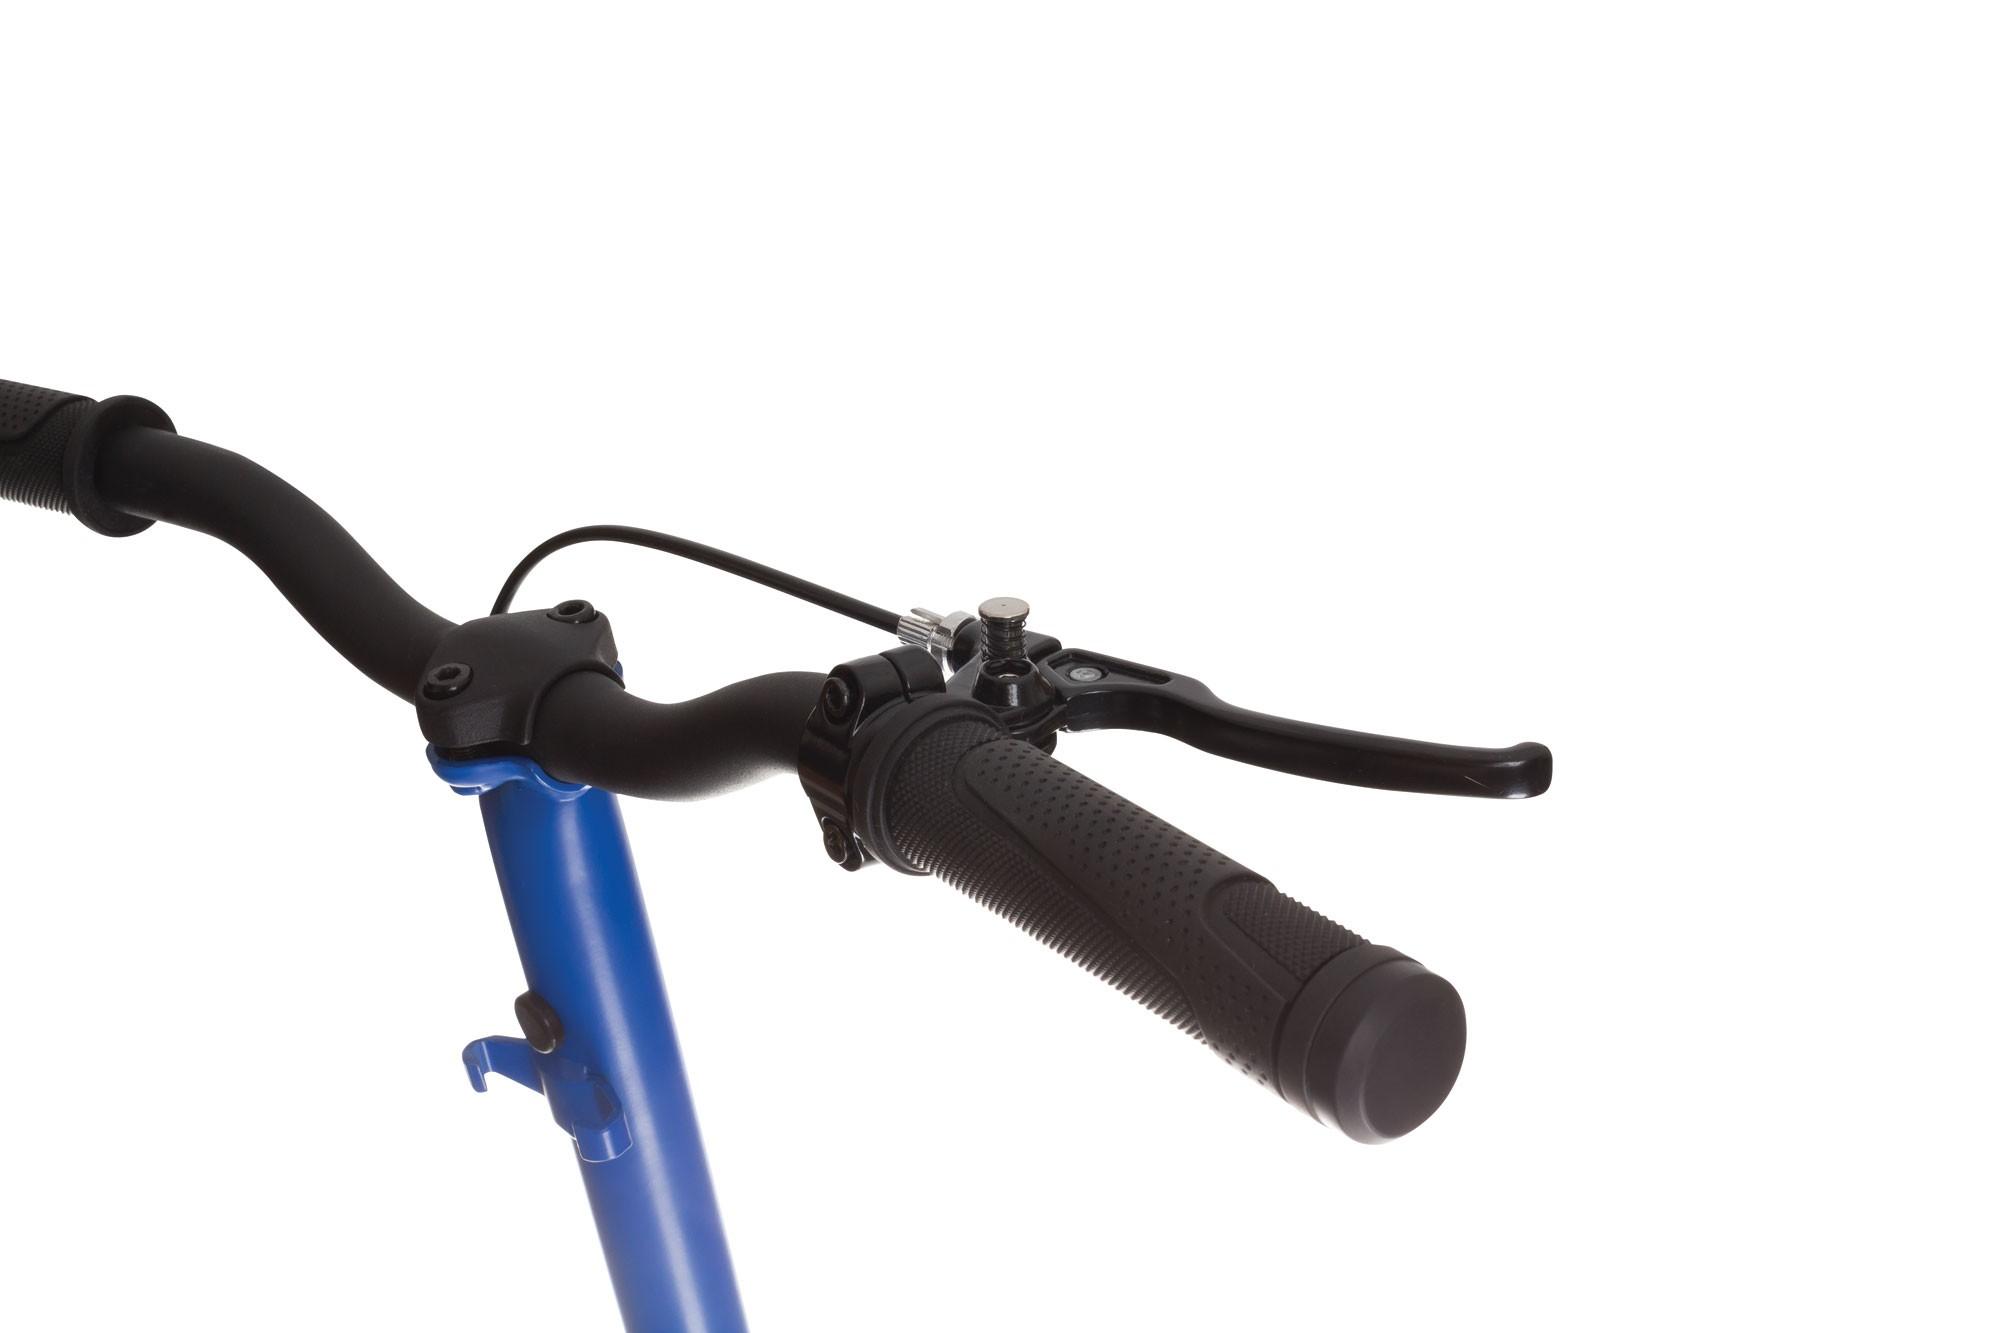 Cityroller / Alu Scooter Globber ONE K 180 BR navy-blau Bild 2